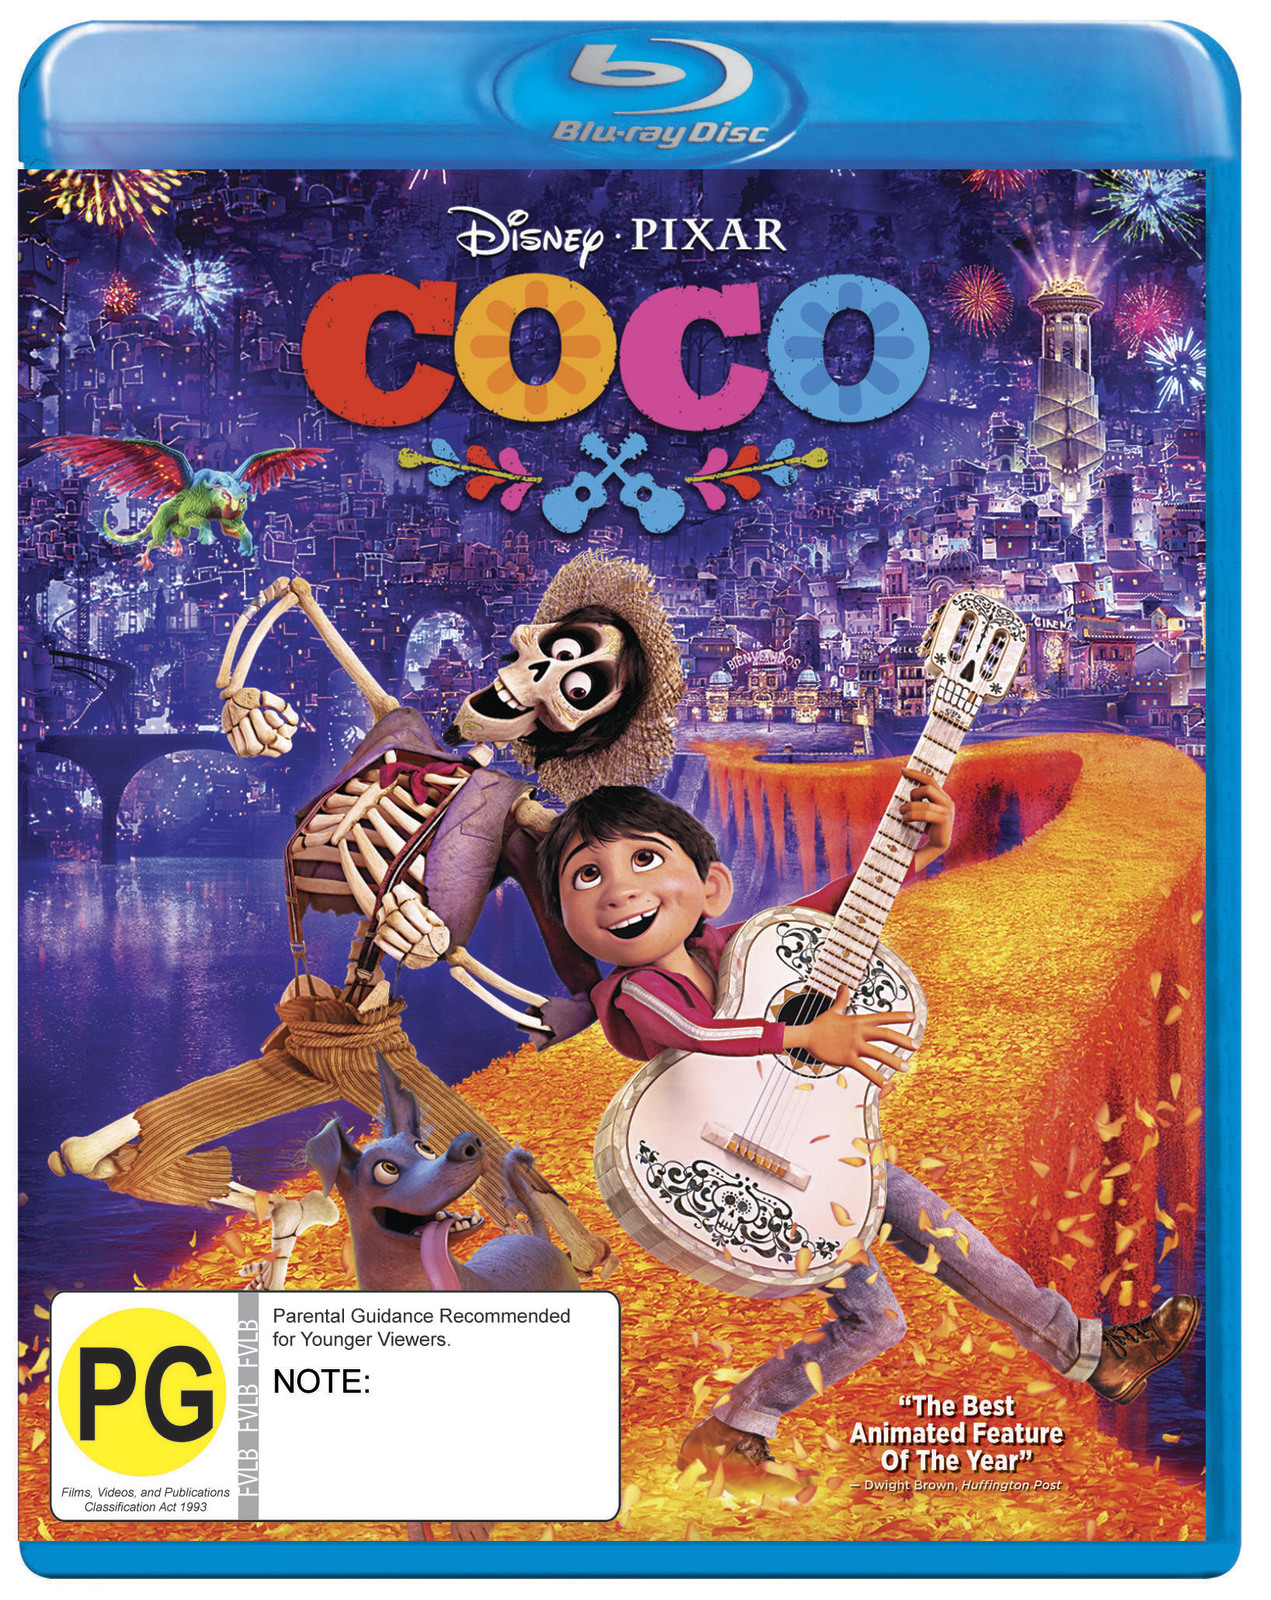 Coco (2017) on Blu-ray image